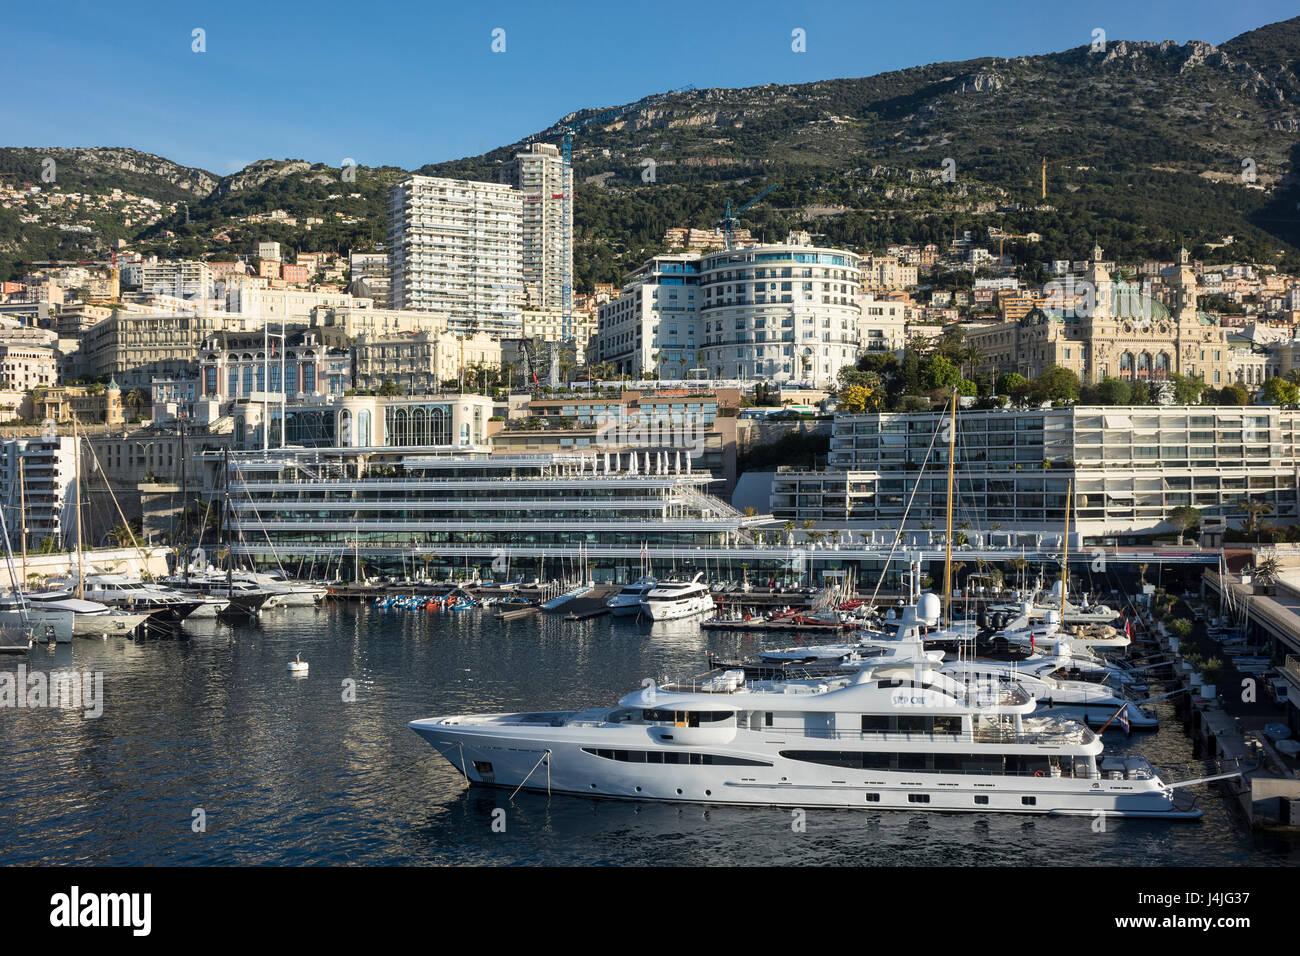 Monaco, Monte Carlo, Port Hercule - Stock Image